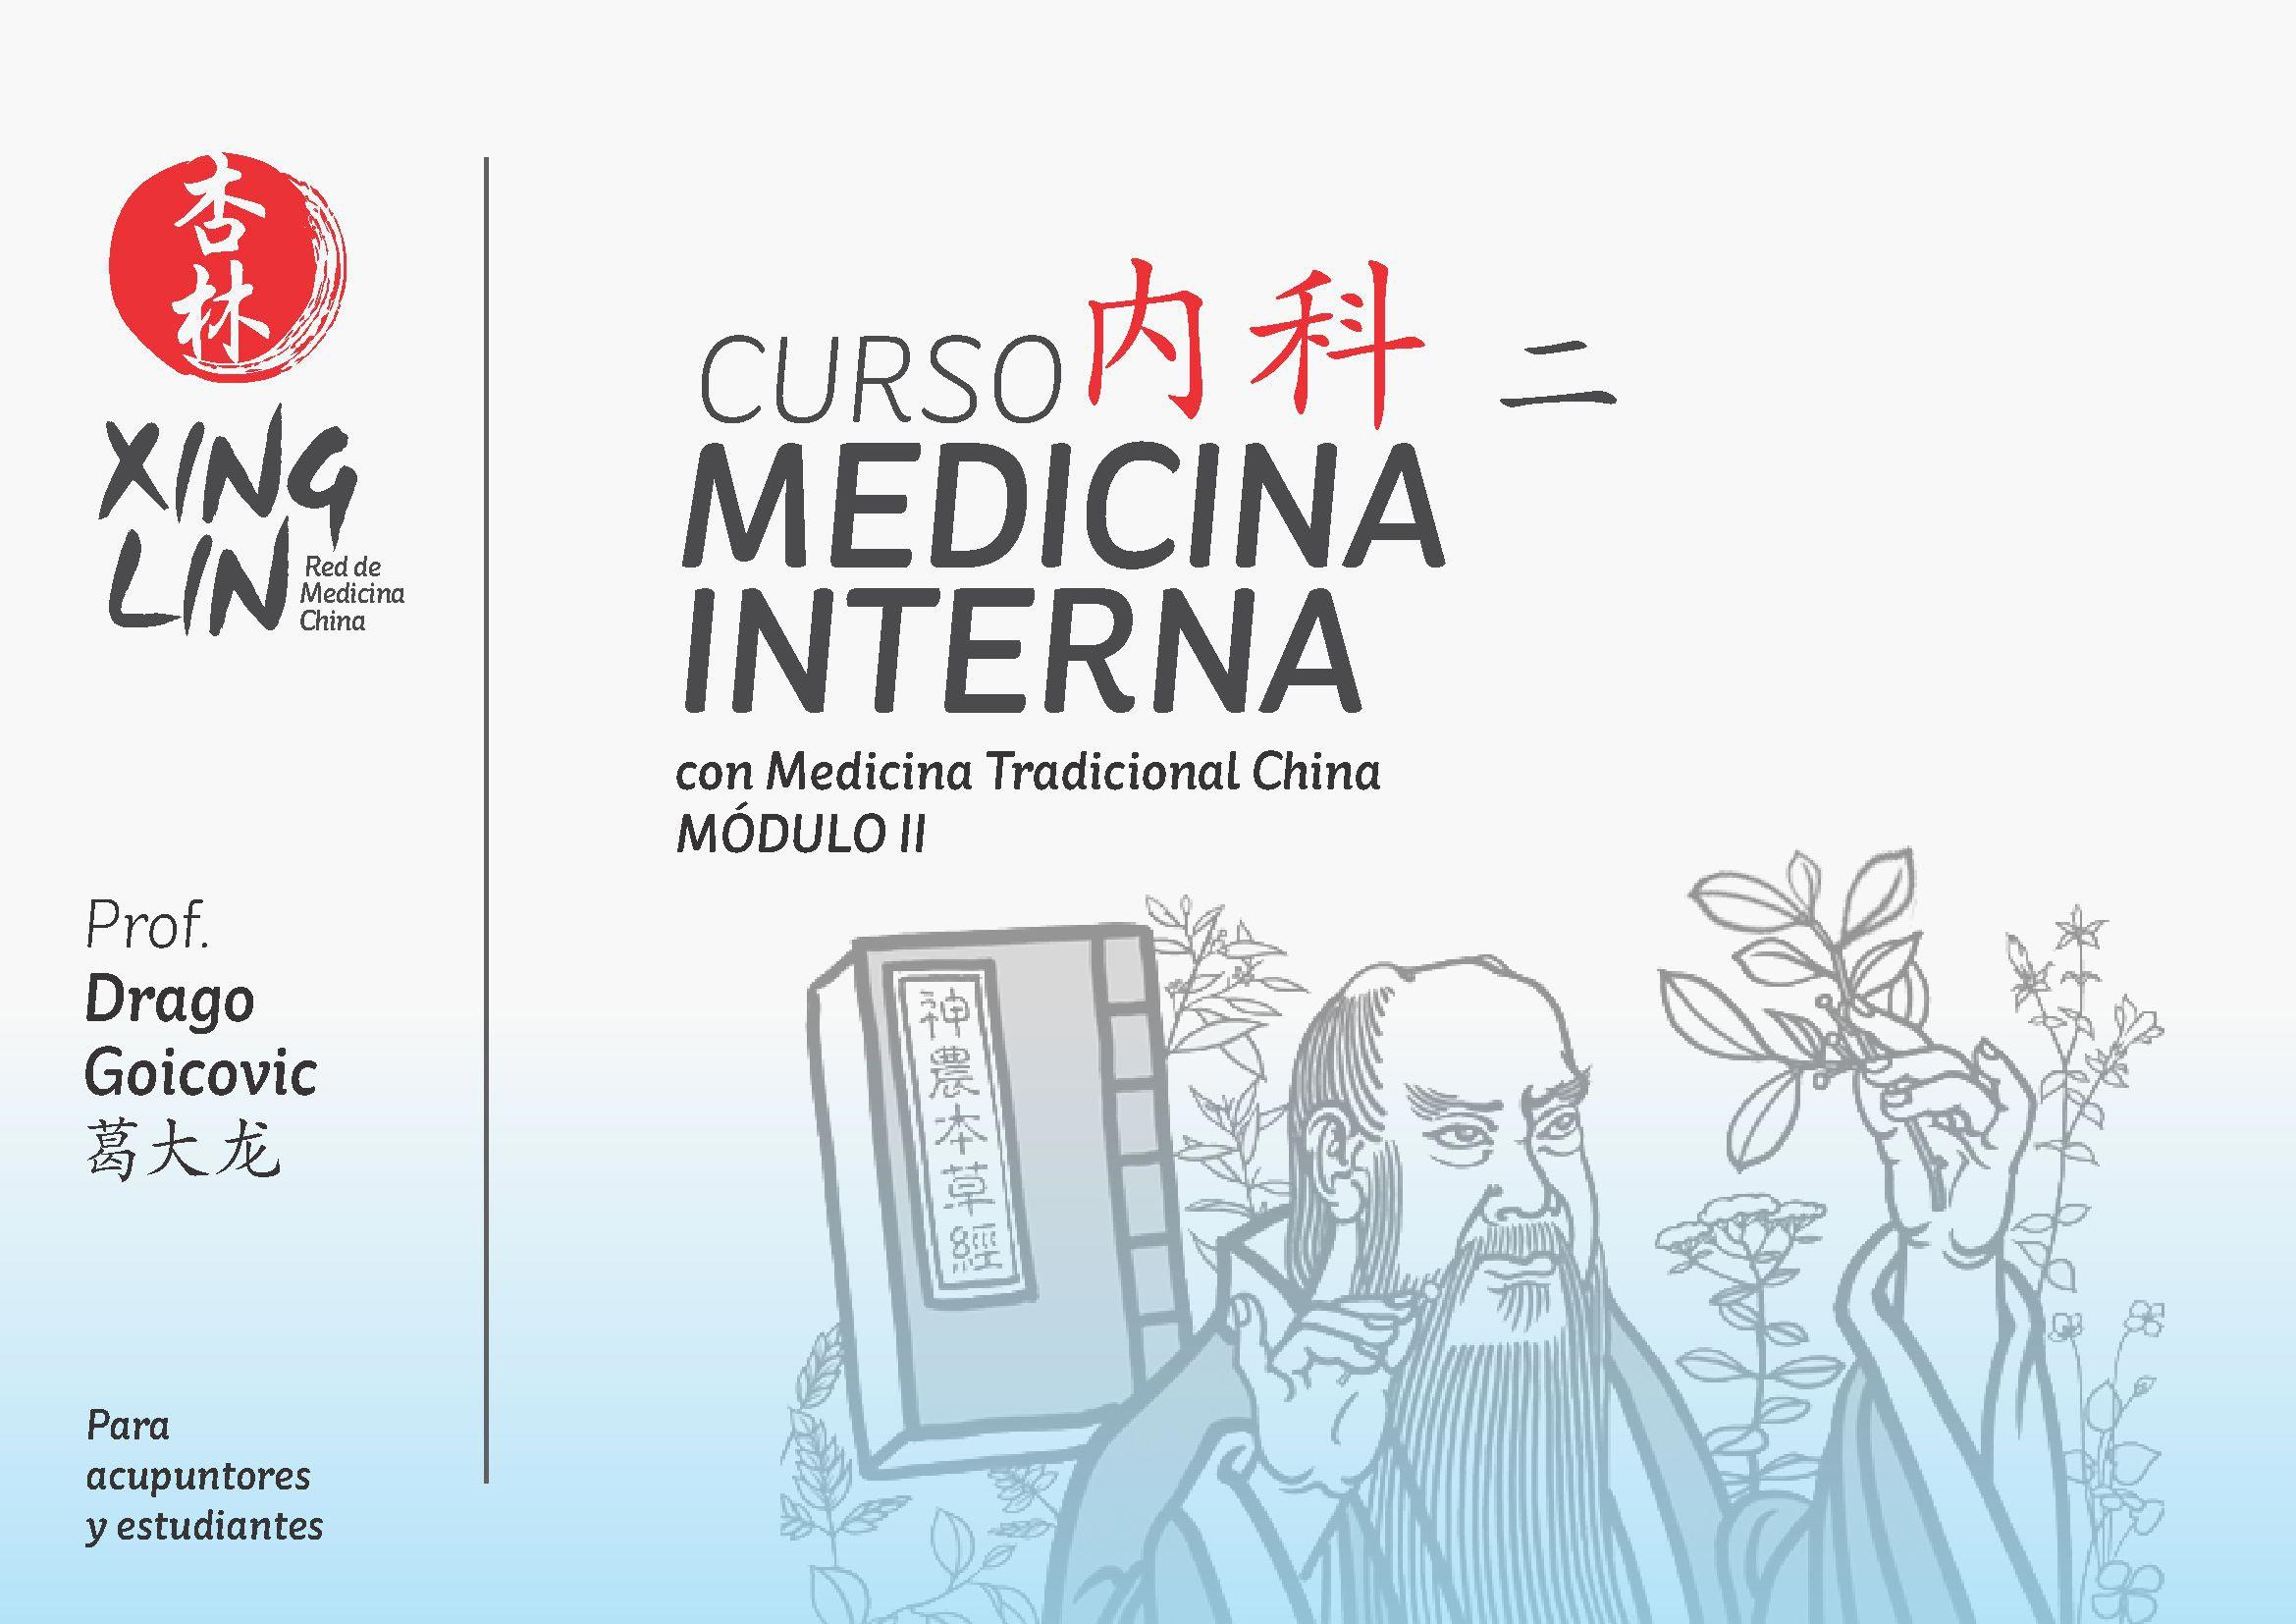 Curso de Medicina Interna con Medicina China (Módulo II) course image